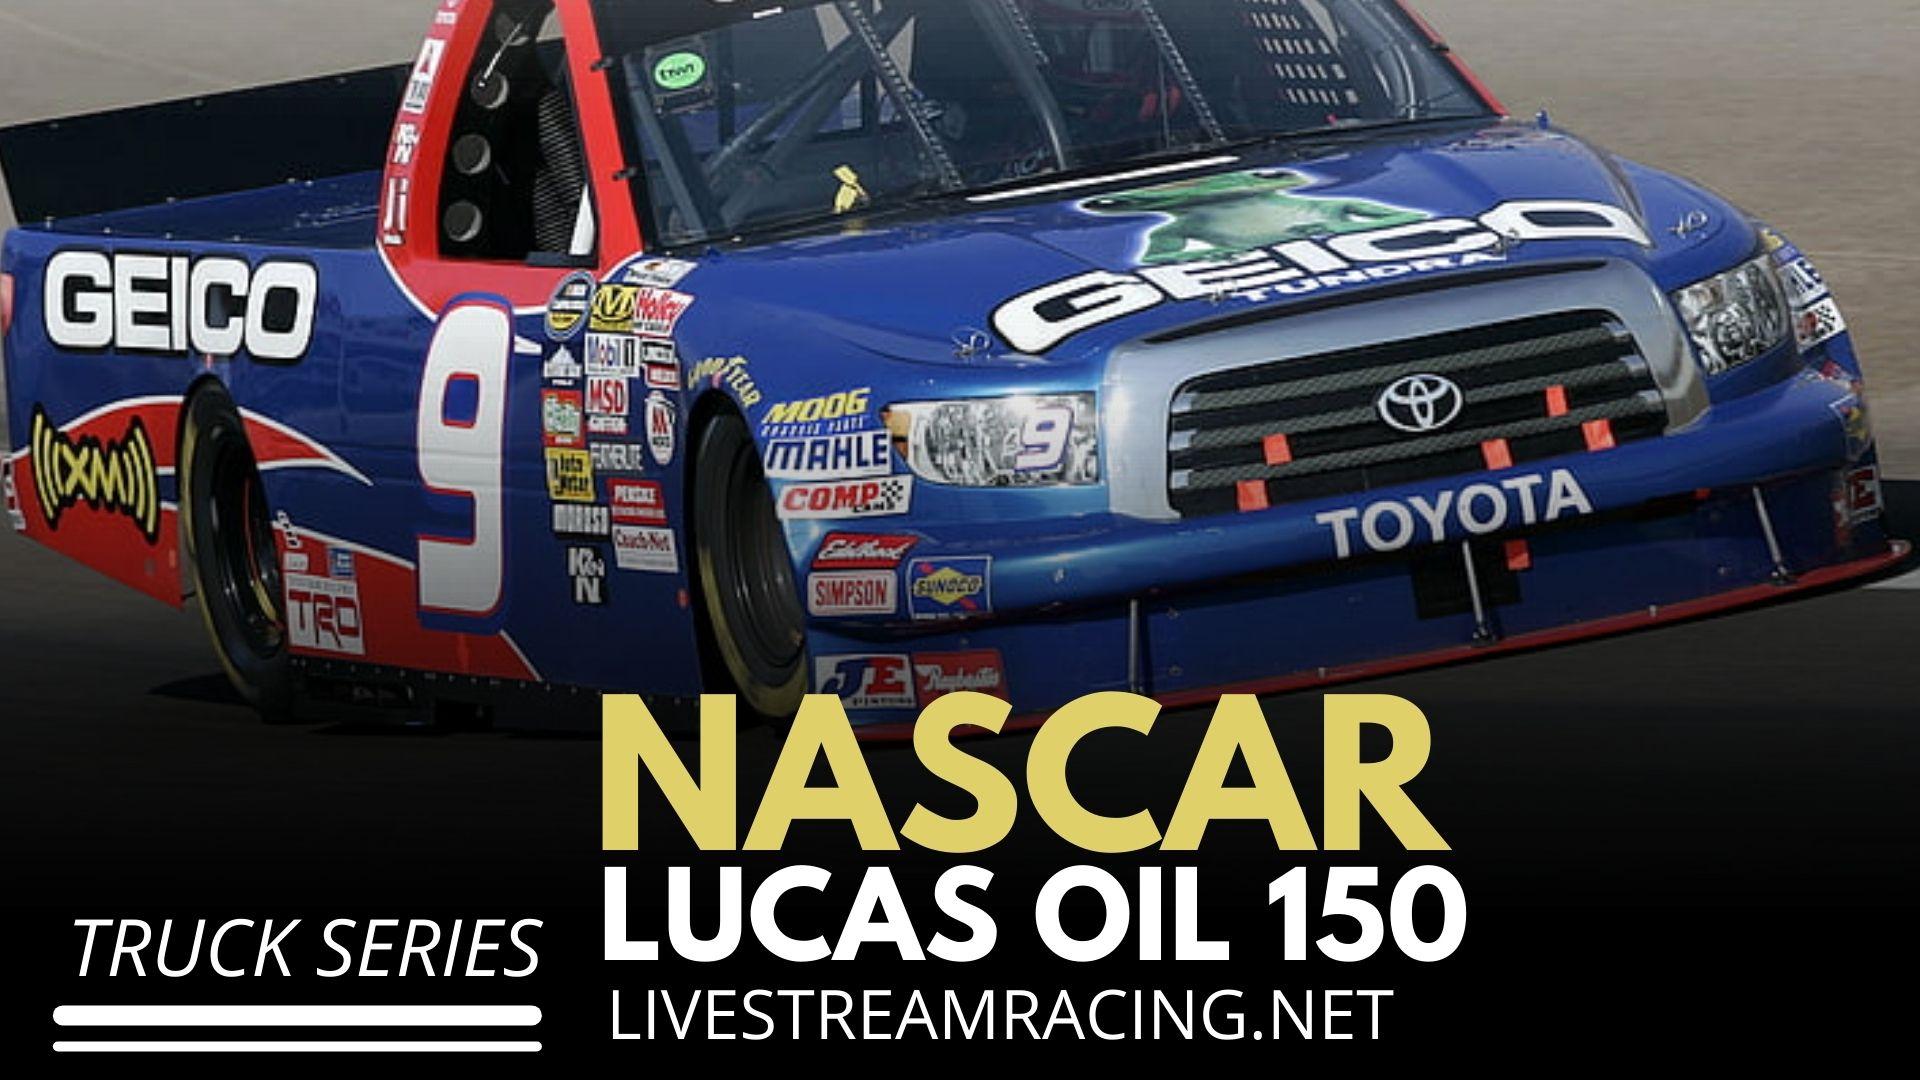 Nascar Lucas Oil 150 Live Stream 2021 - Truck Series